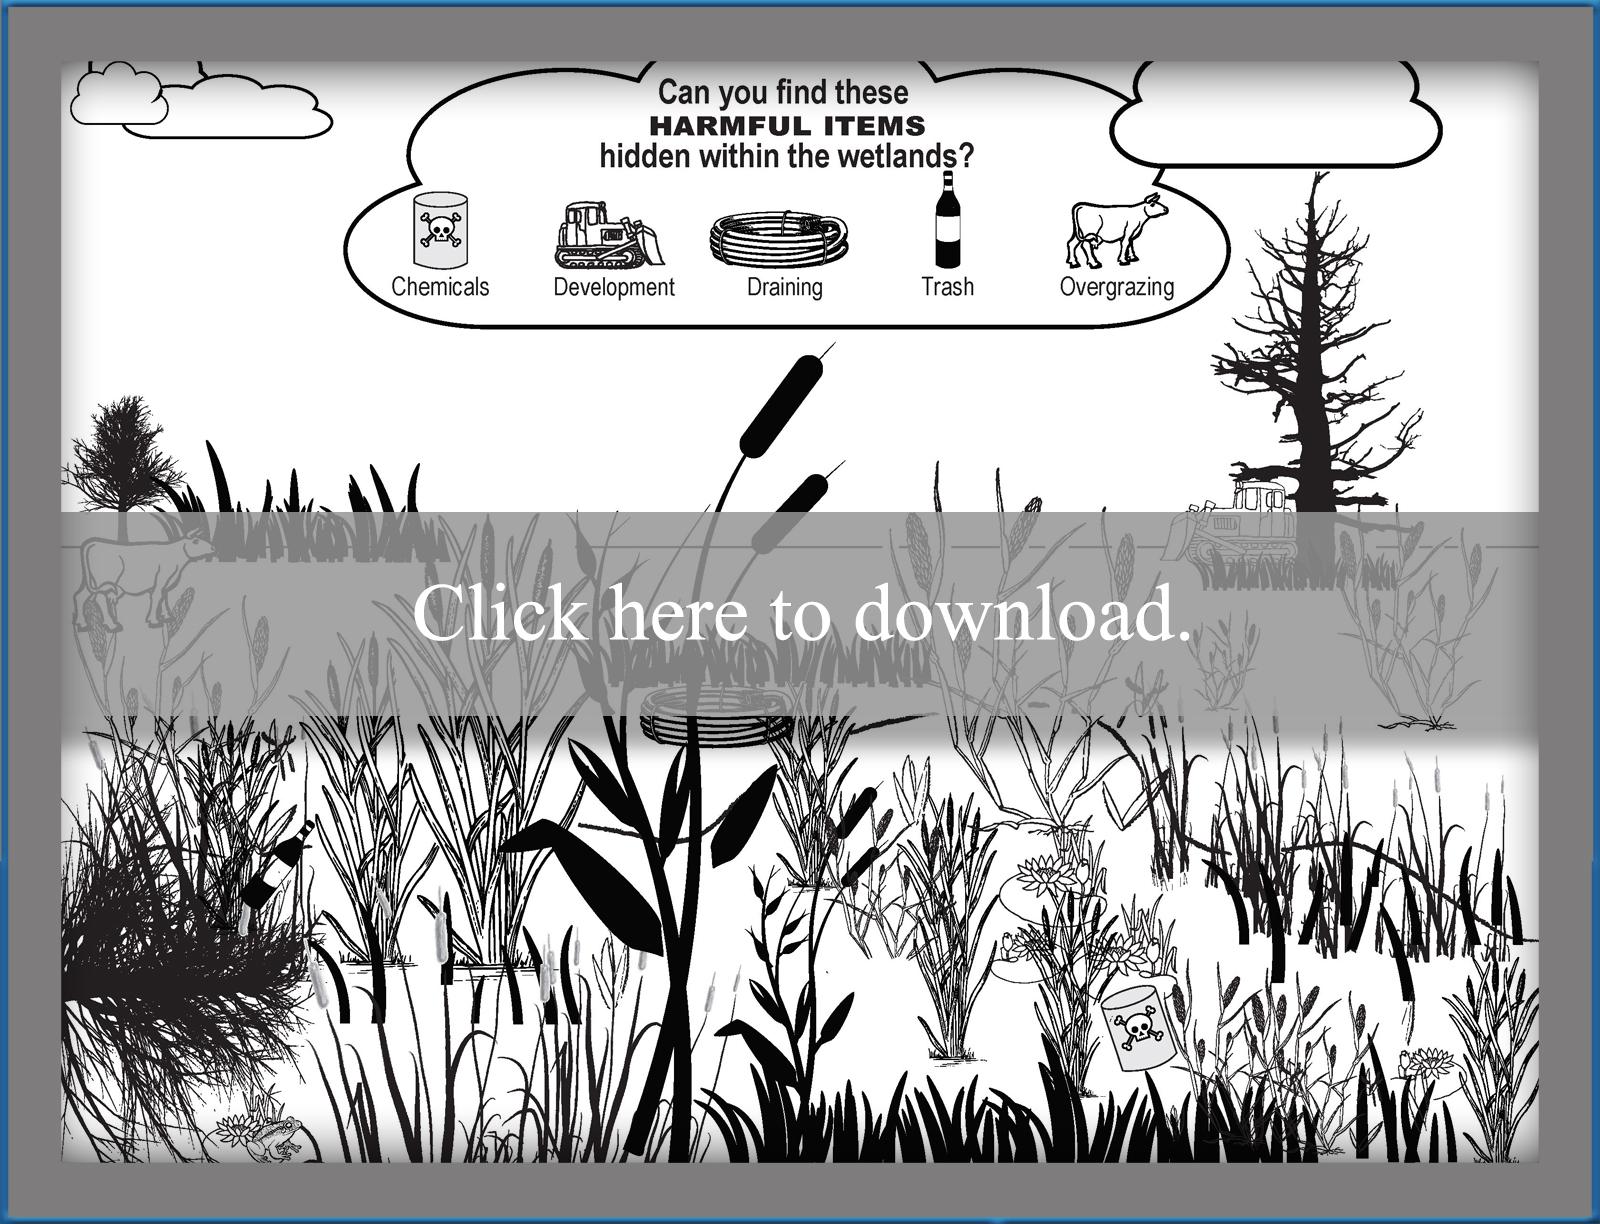 printable wetland search and find worksheet - Search And Find Pictures Printable